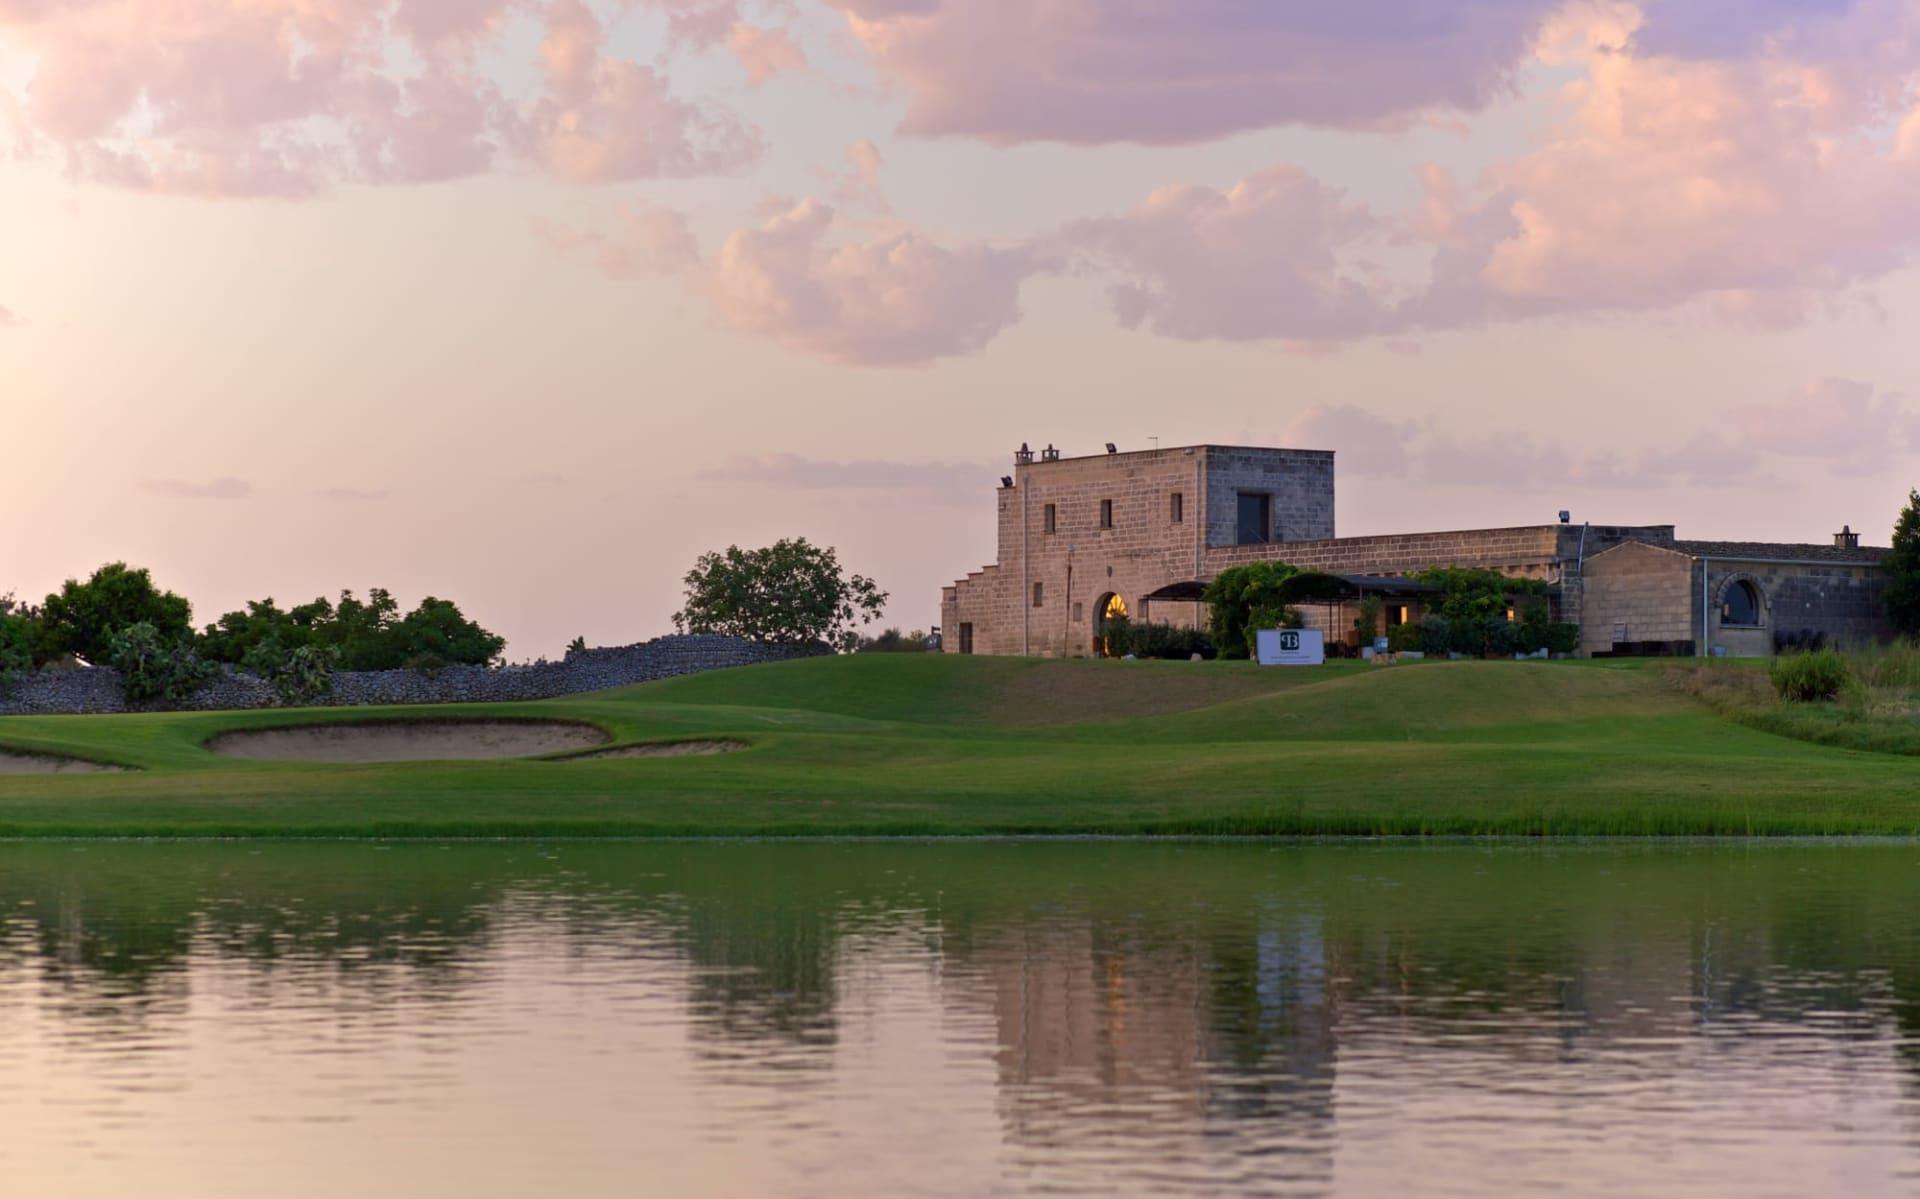 17.04. - 24.04.2022 Golf & Kultur in Apulien ab Brindisi: Acaya Golf